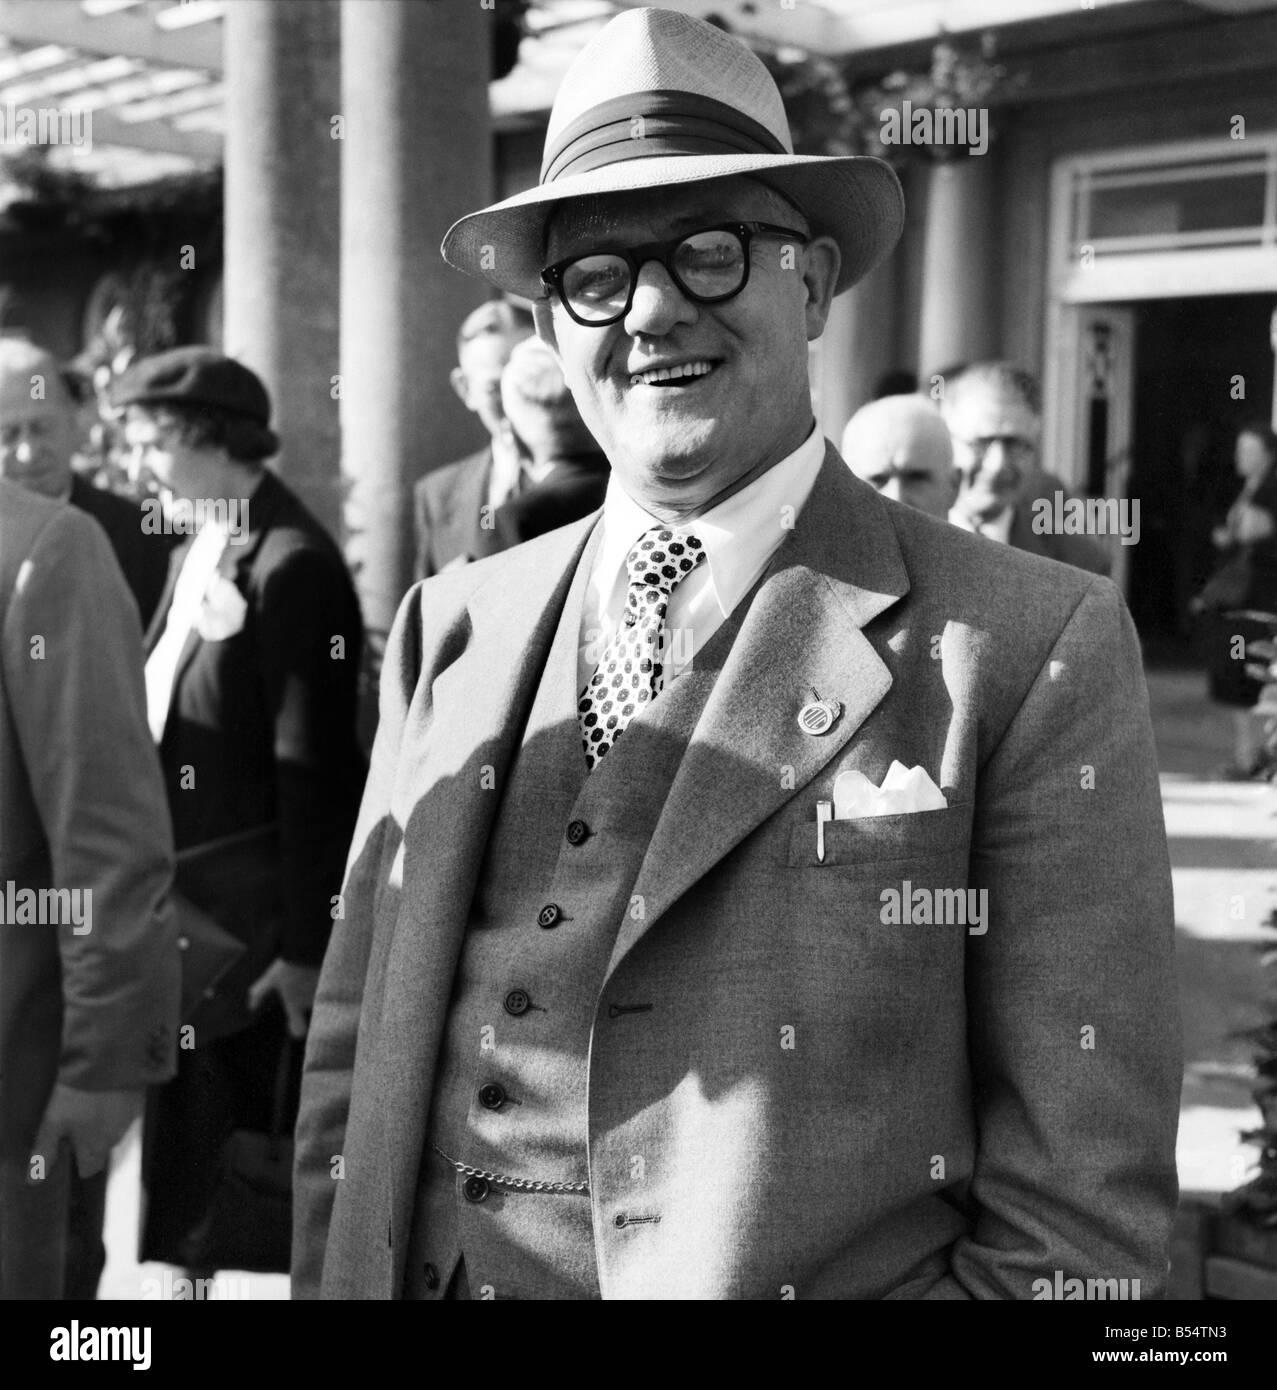 T.U.C. Douglas, Isle of Man 1953. Arthur Deakin Secretary of the Transport and General Workers Union. September 1953 D5569-004 Stock Photo